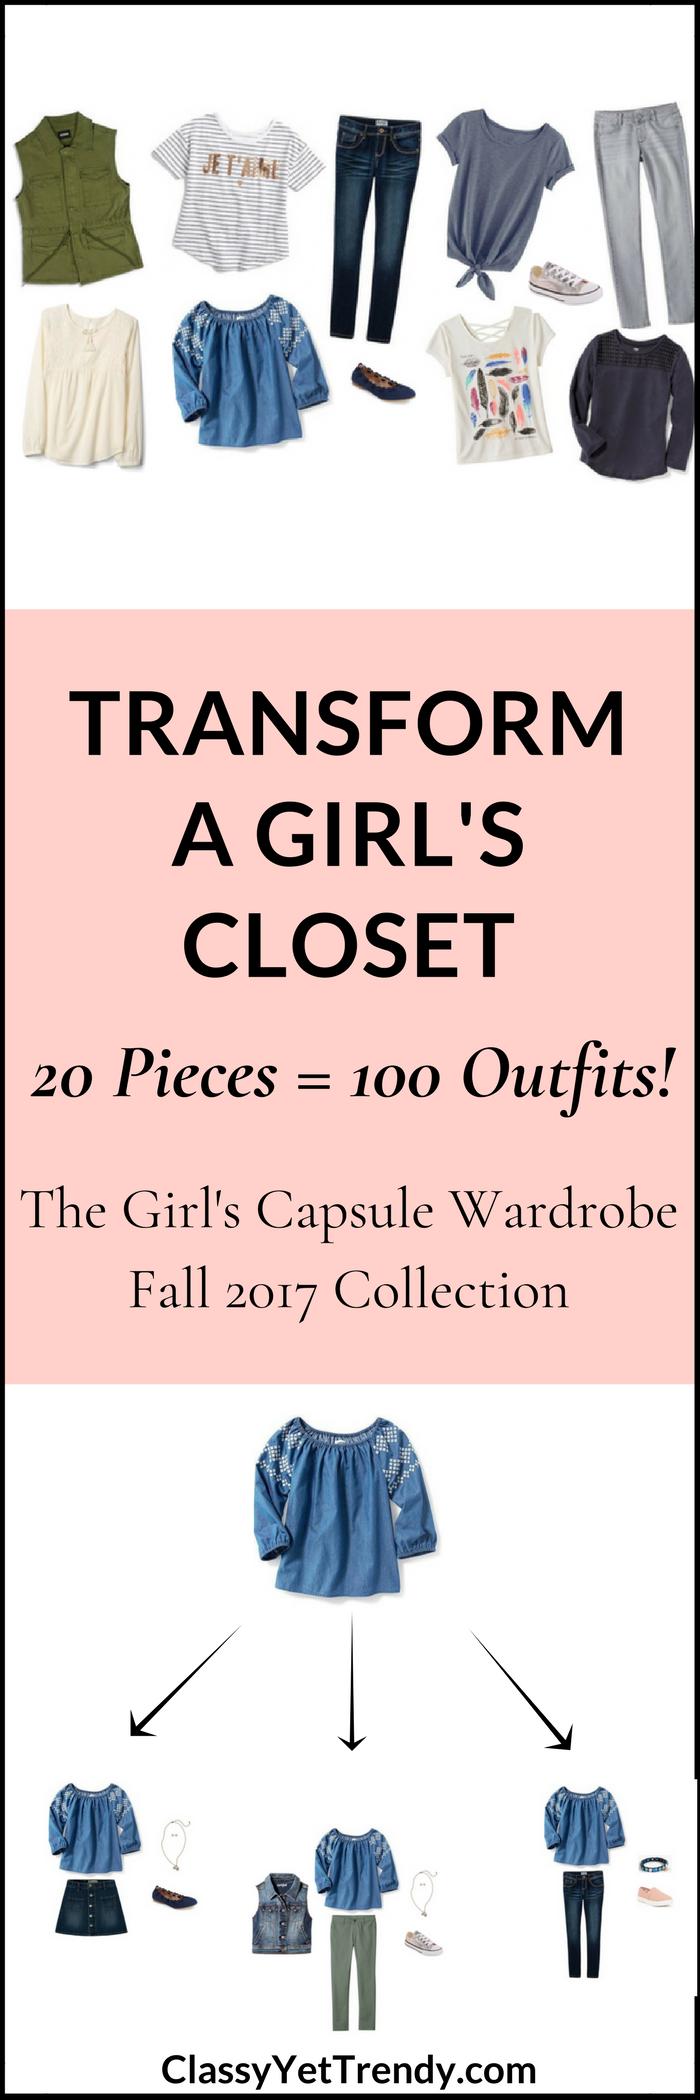 Girl's Capsule Wardrobe - Fall 2017